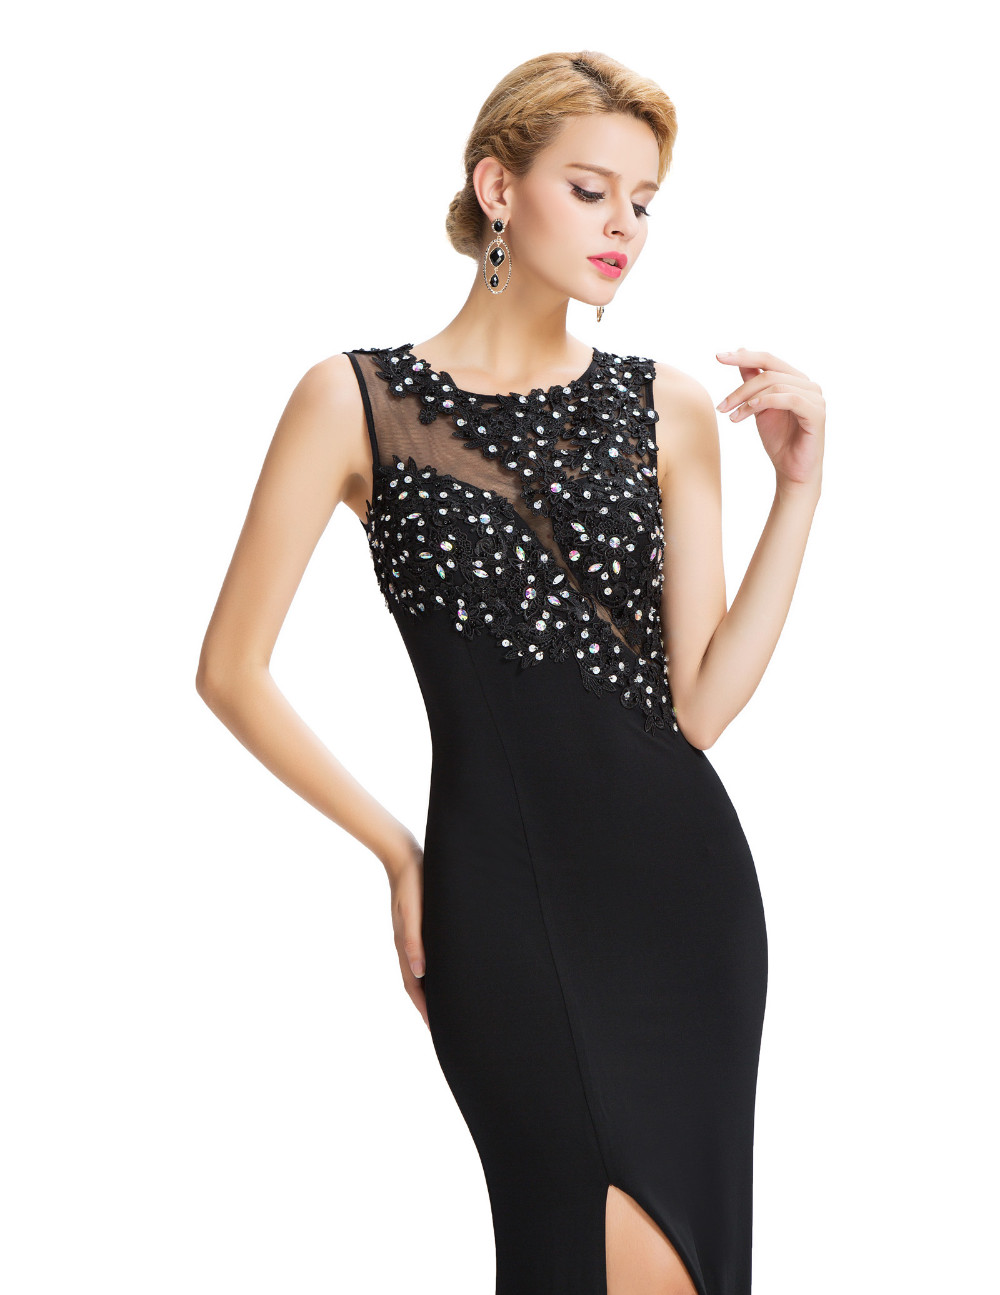 Grace Karin Sleeveless Black Mermaid Evening Dresses Floor Length Elegant Long Formal Dresses Robe De Soiree Sexy Evening Gowns 12